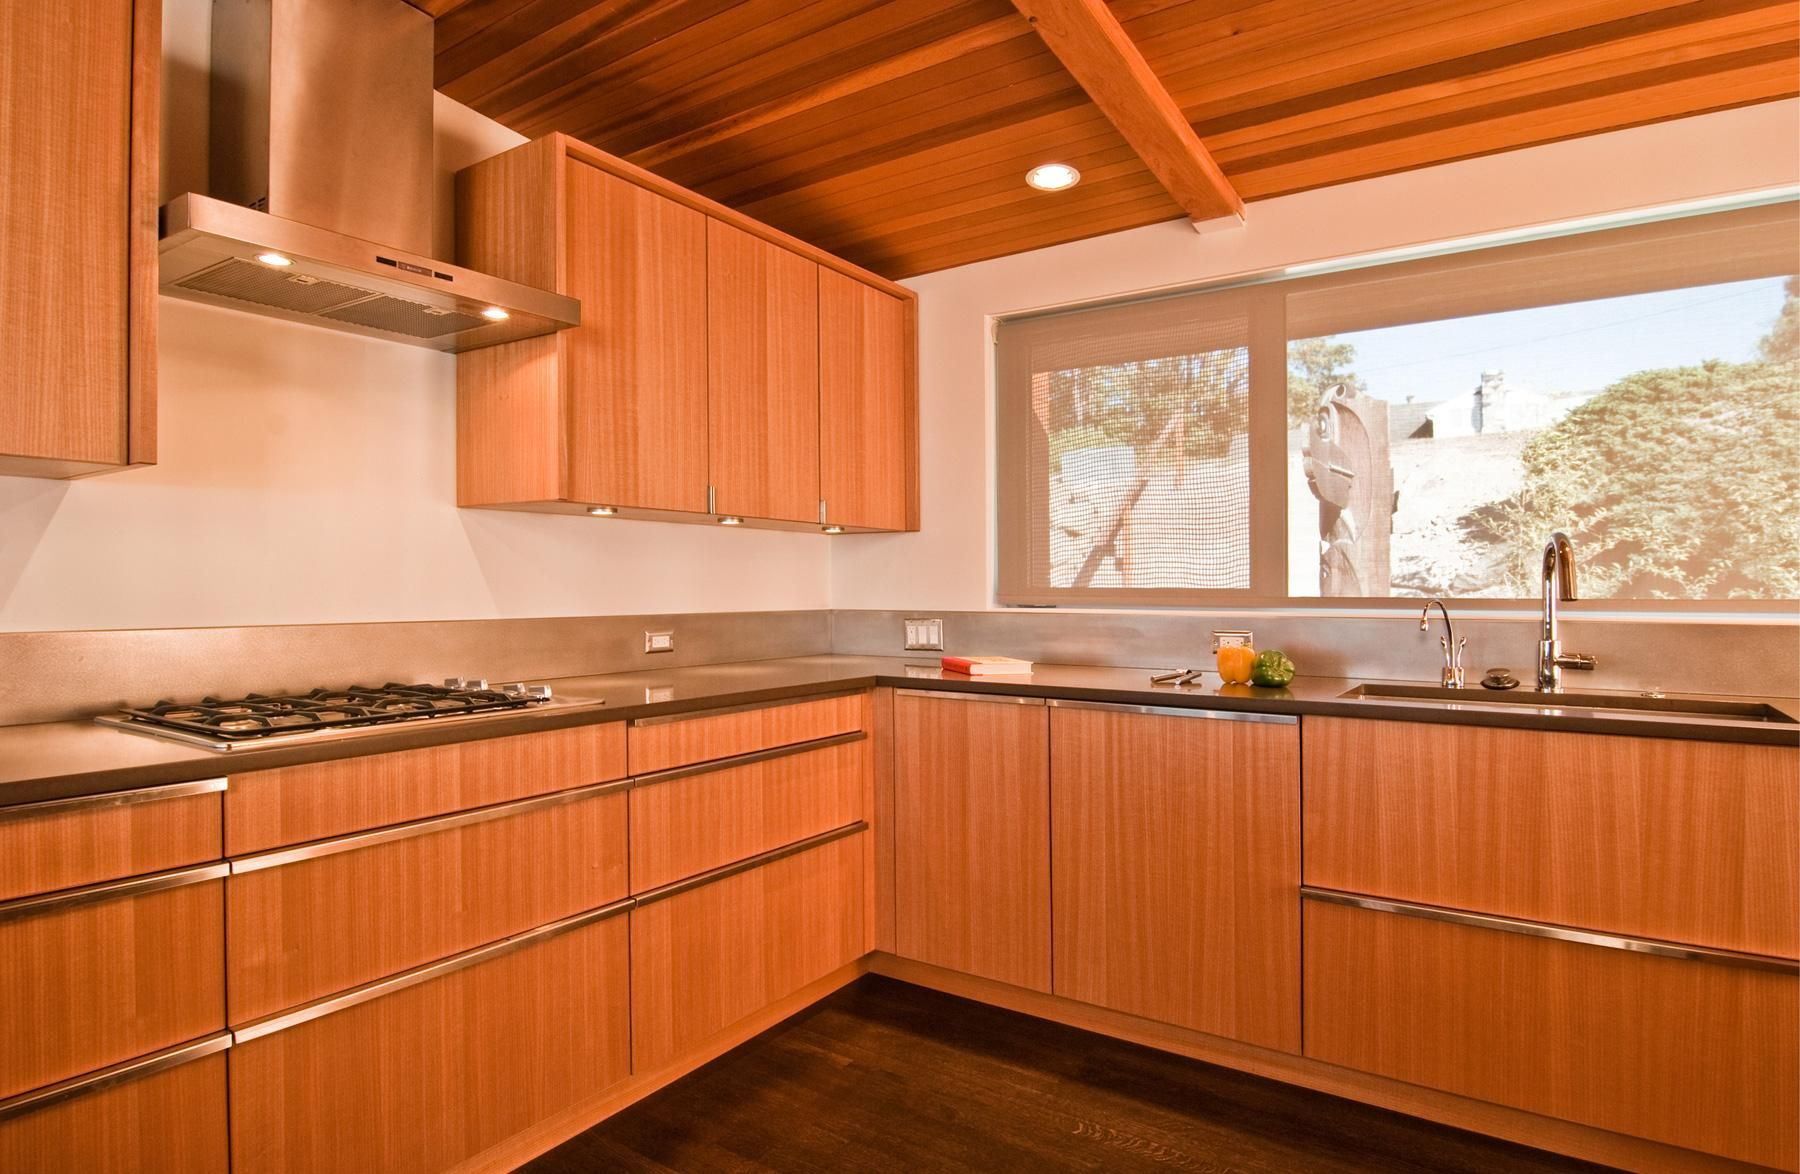 mid-century kitchen maybe teak? nice lines. built 1960 - architect